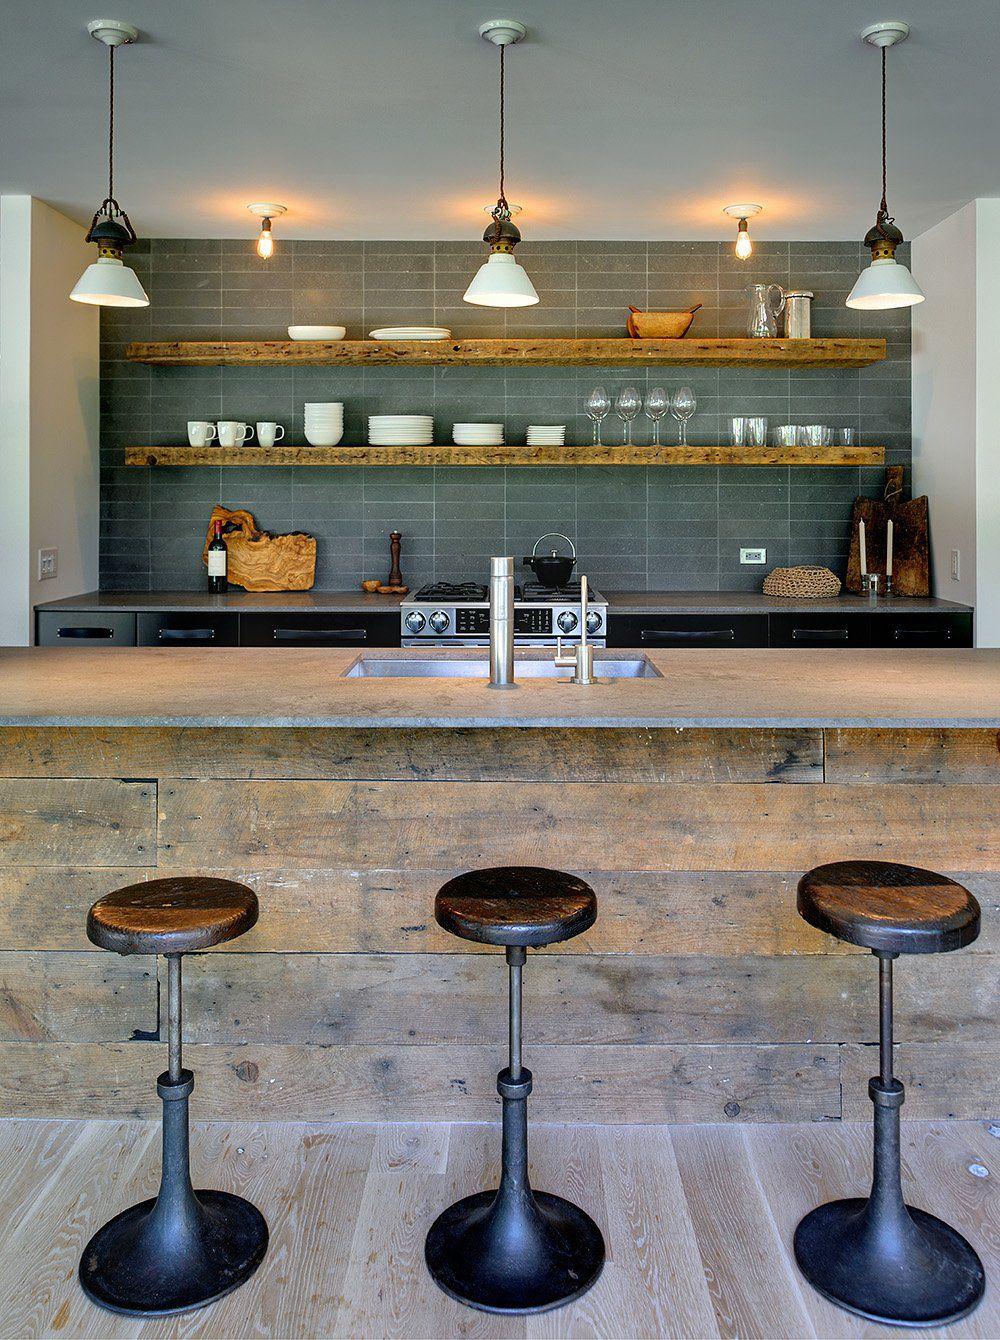 Robins Kitchen Garden City Robins Way Residence By Bates Masi Architects Caandesign